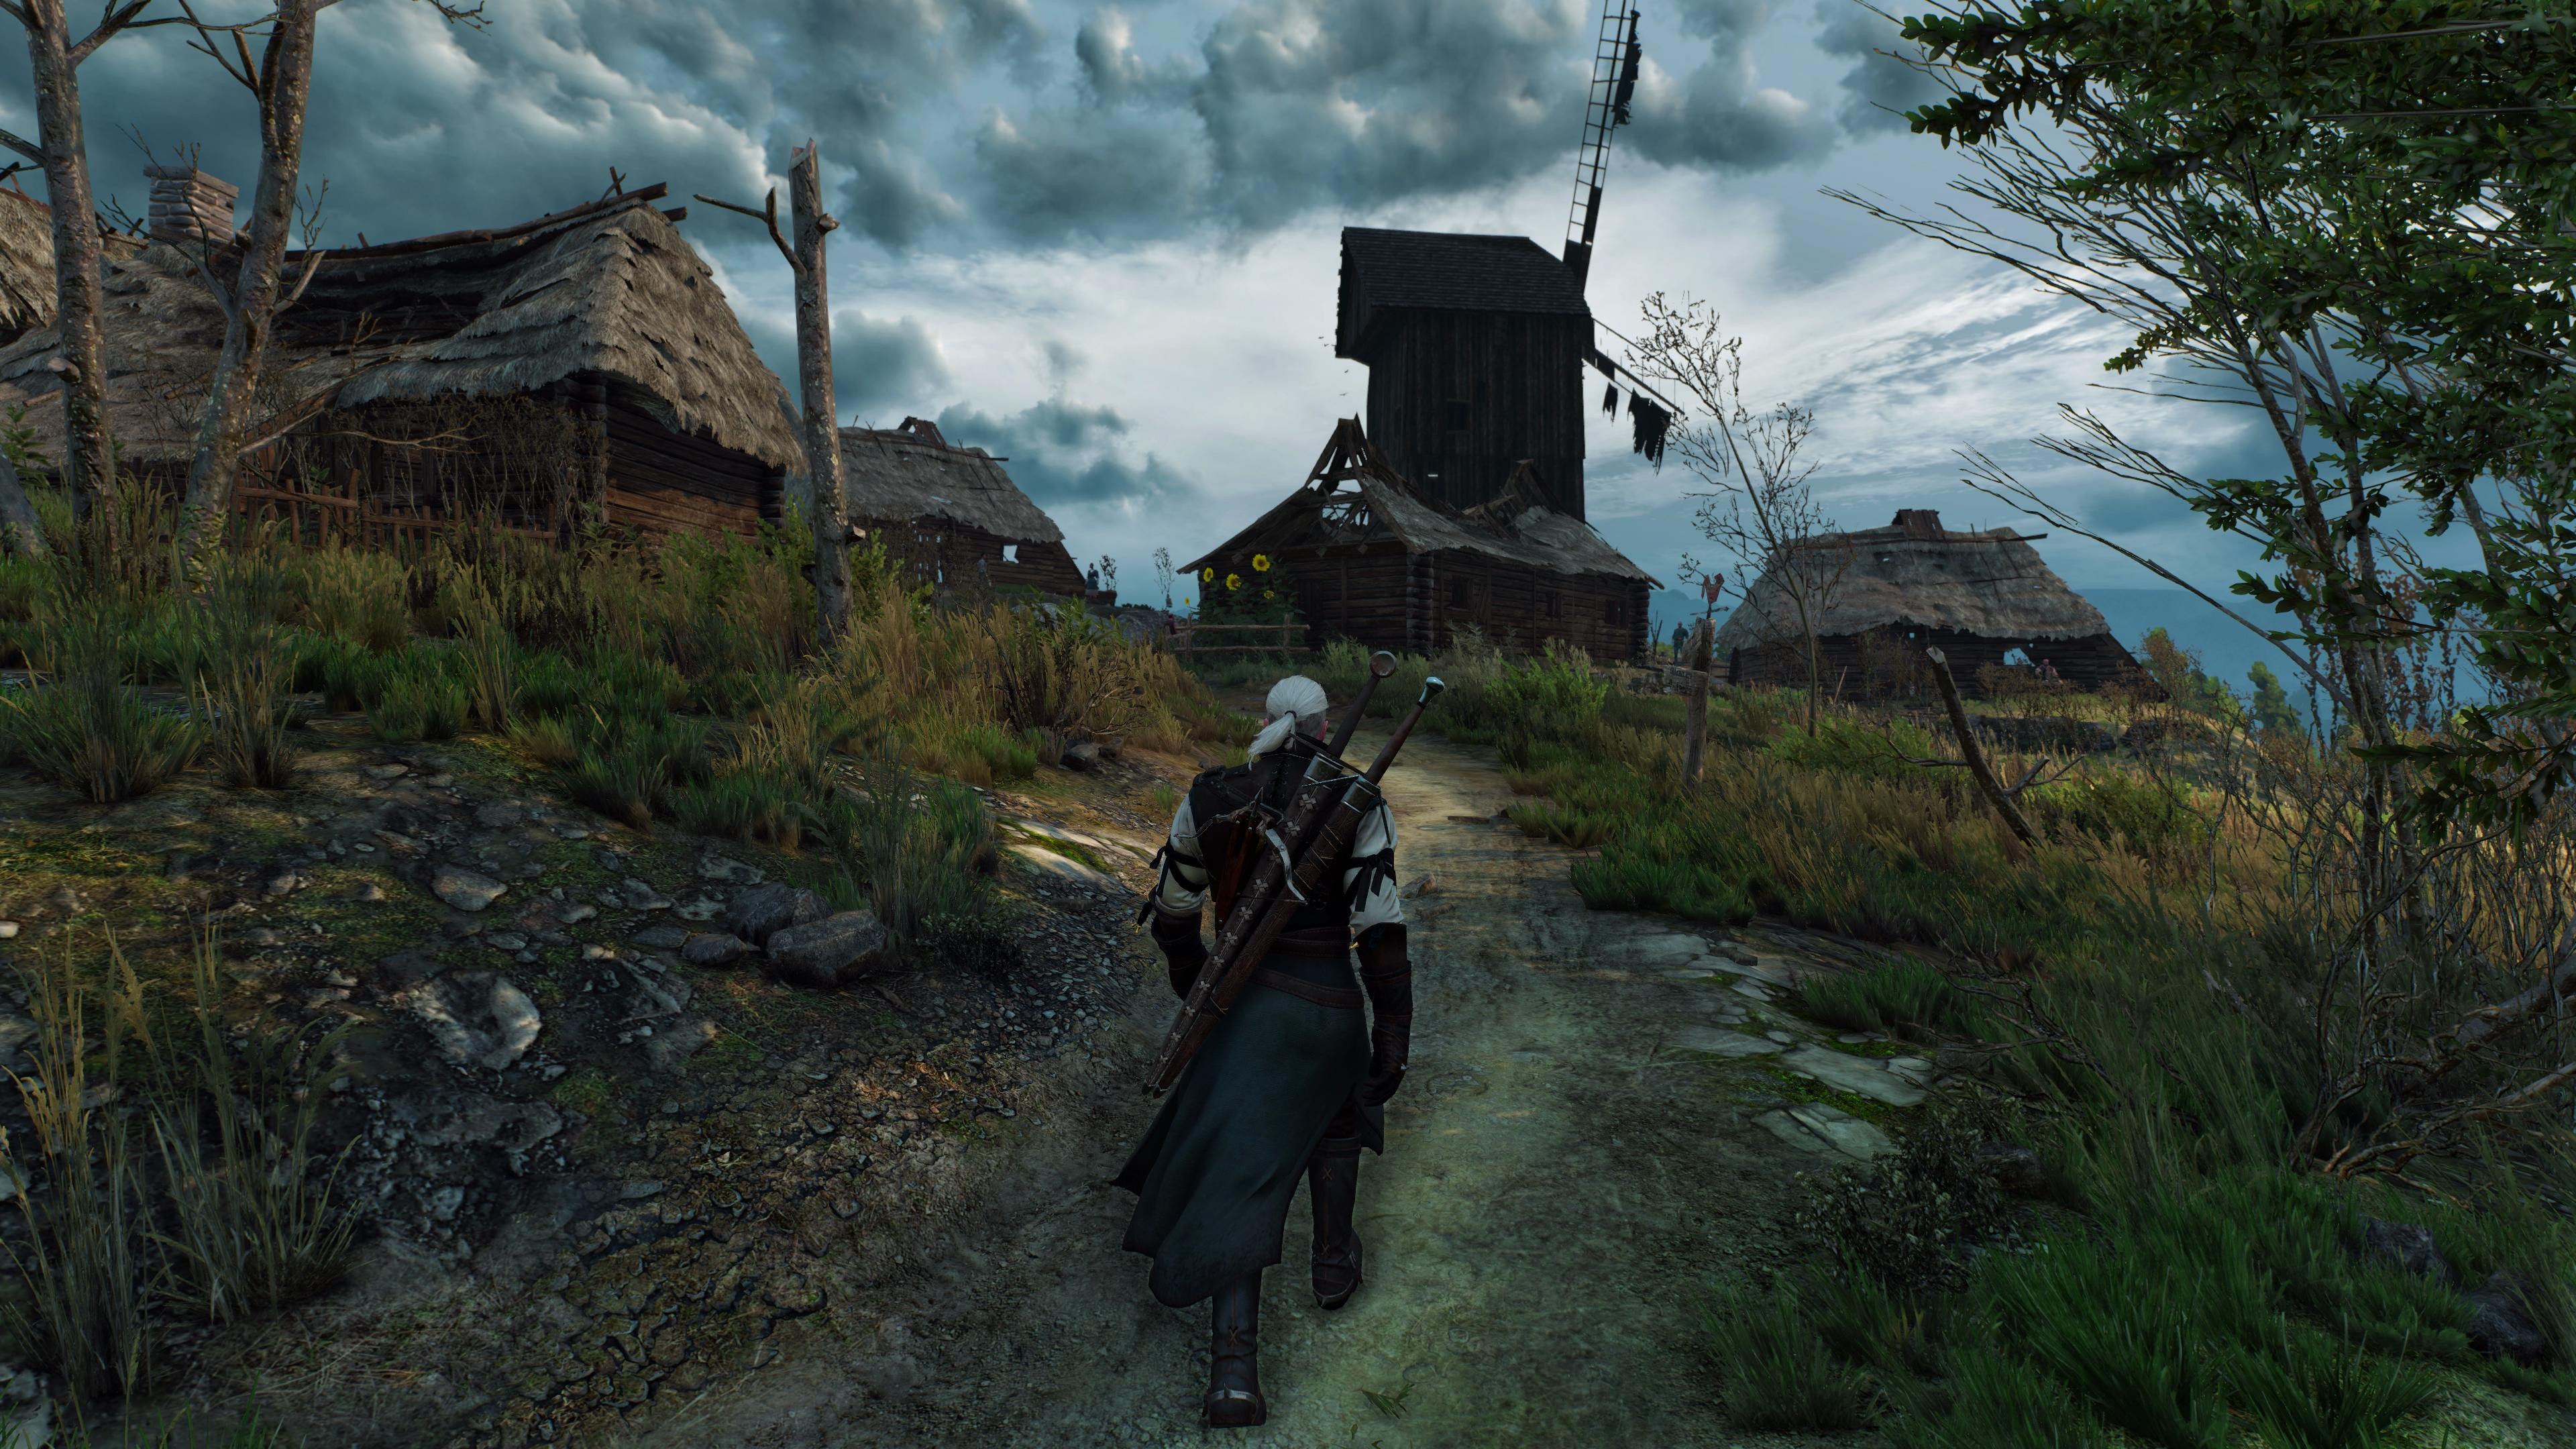 the-witcher-3-wild-hunt-4k-screenshot